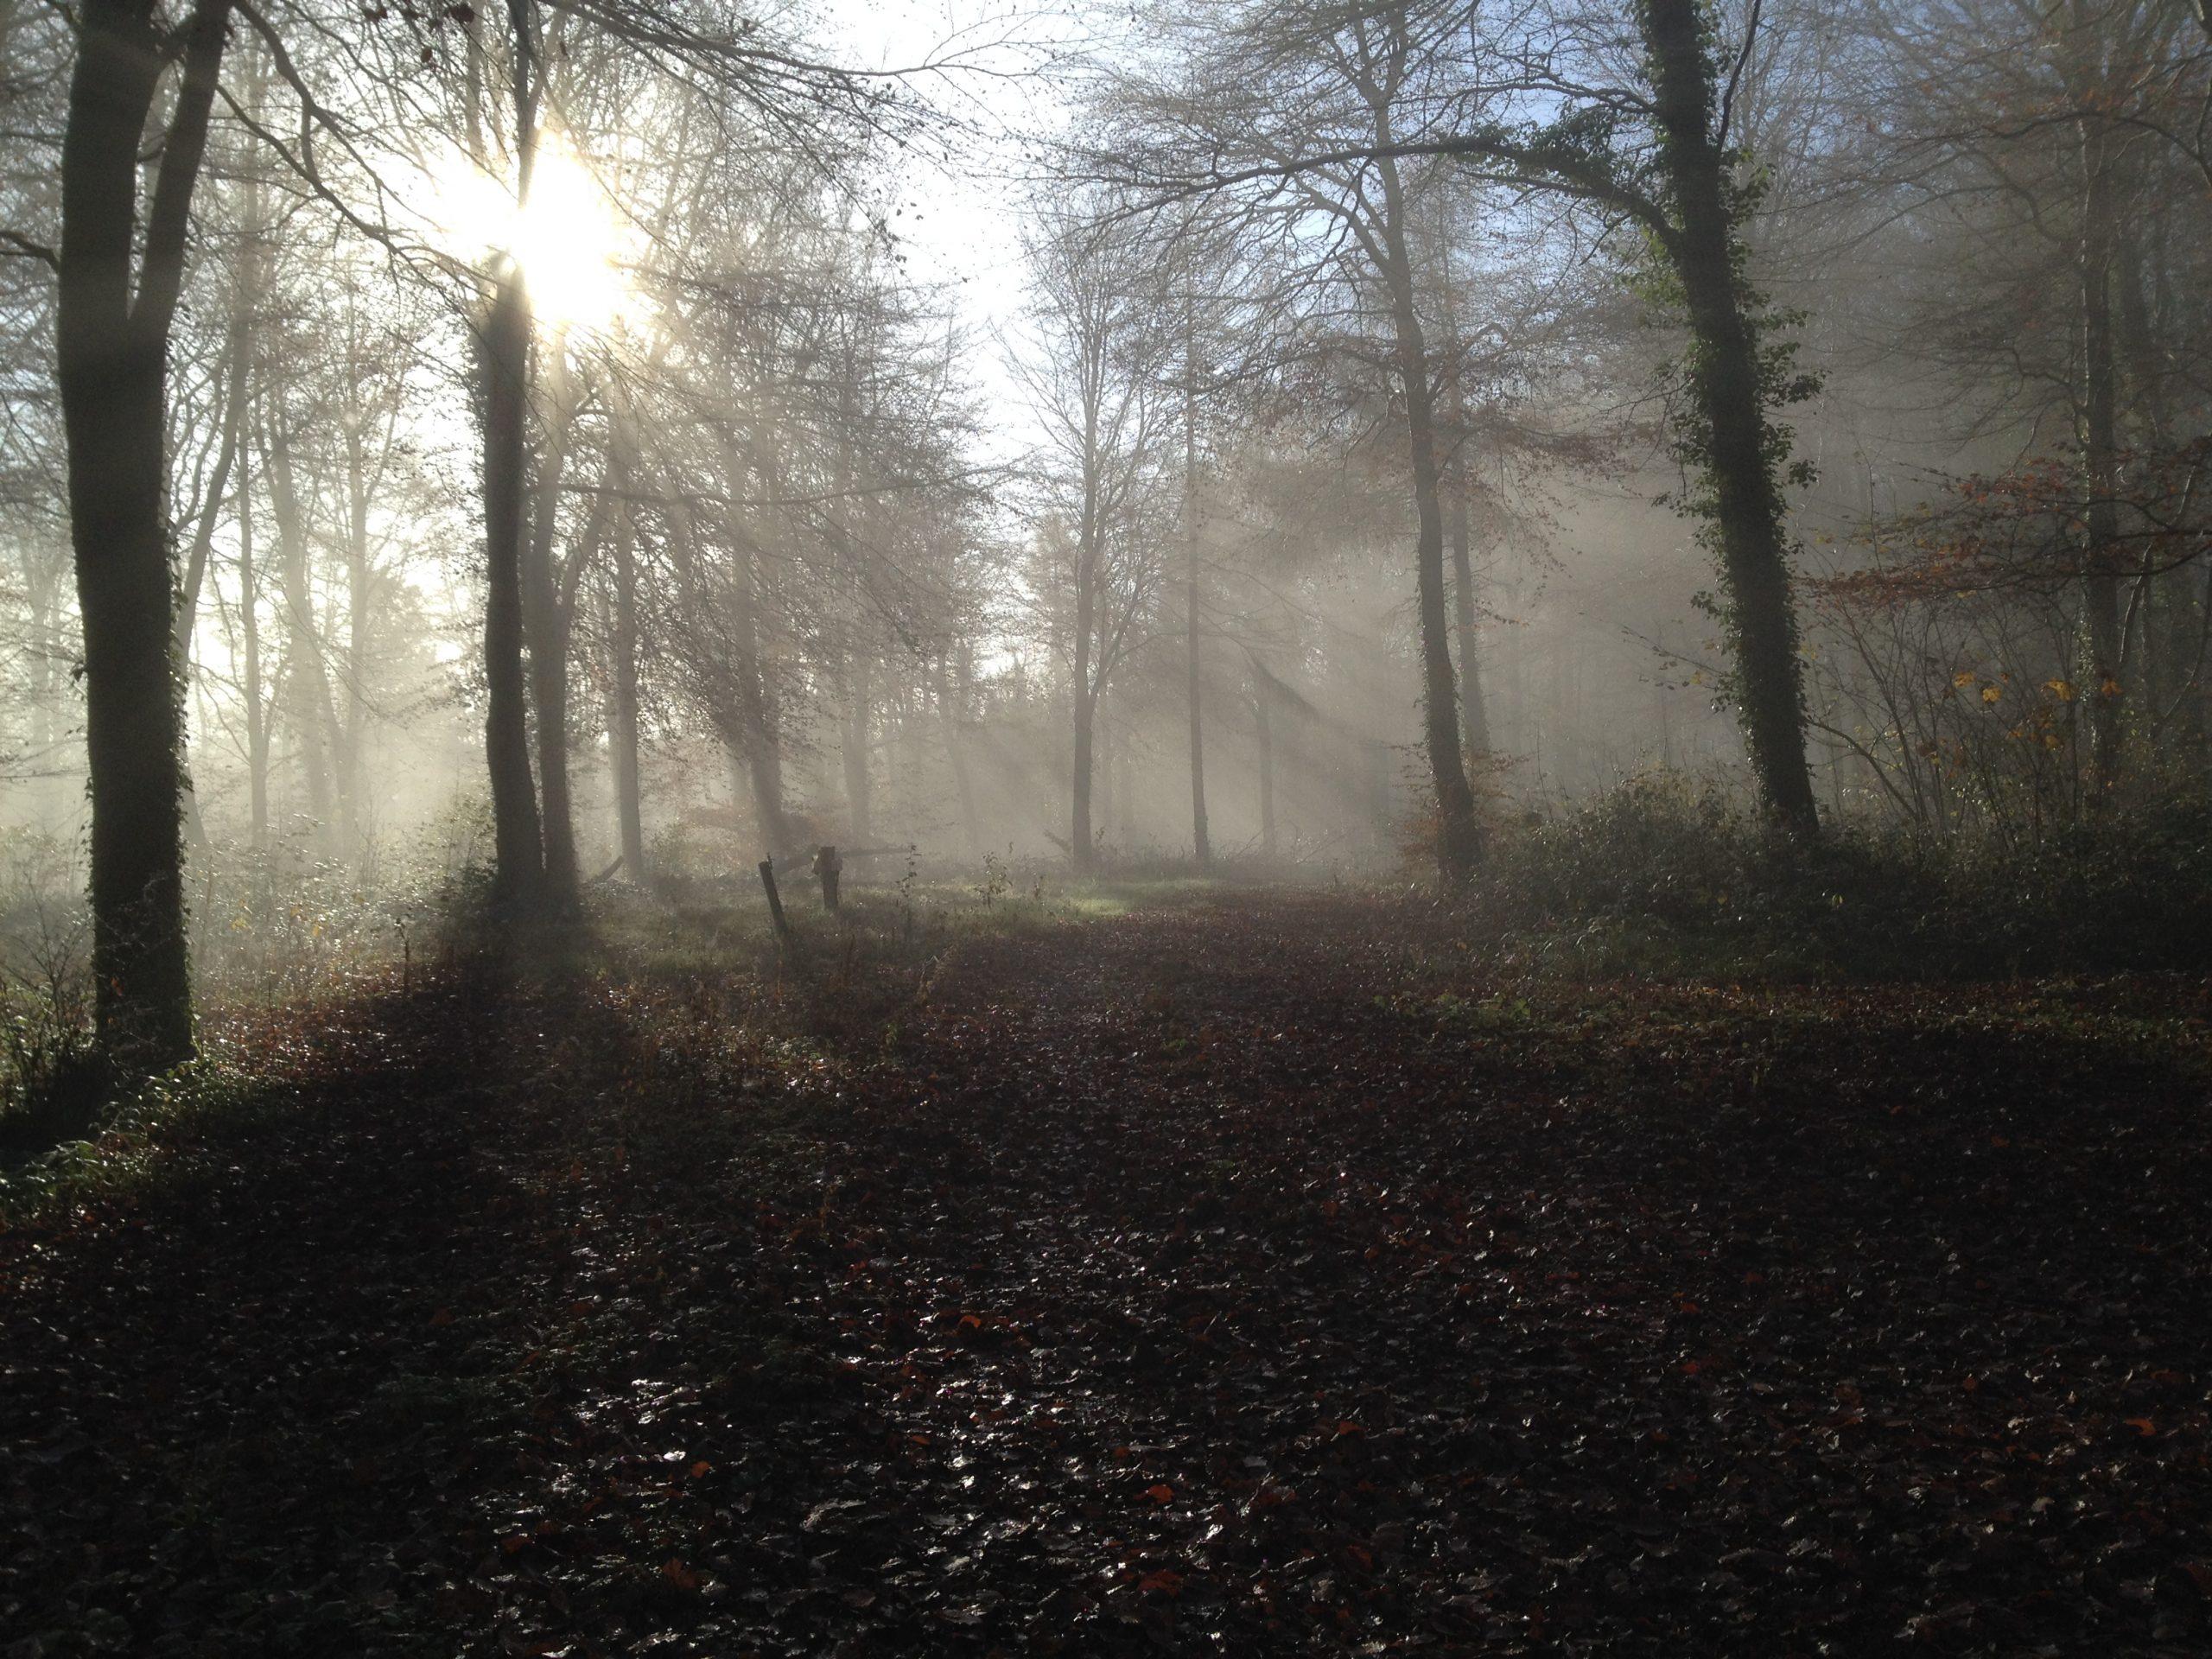 Autumn in Curraghchase II